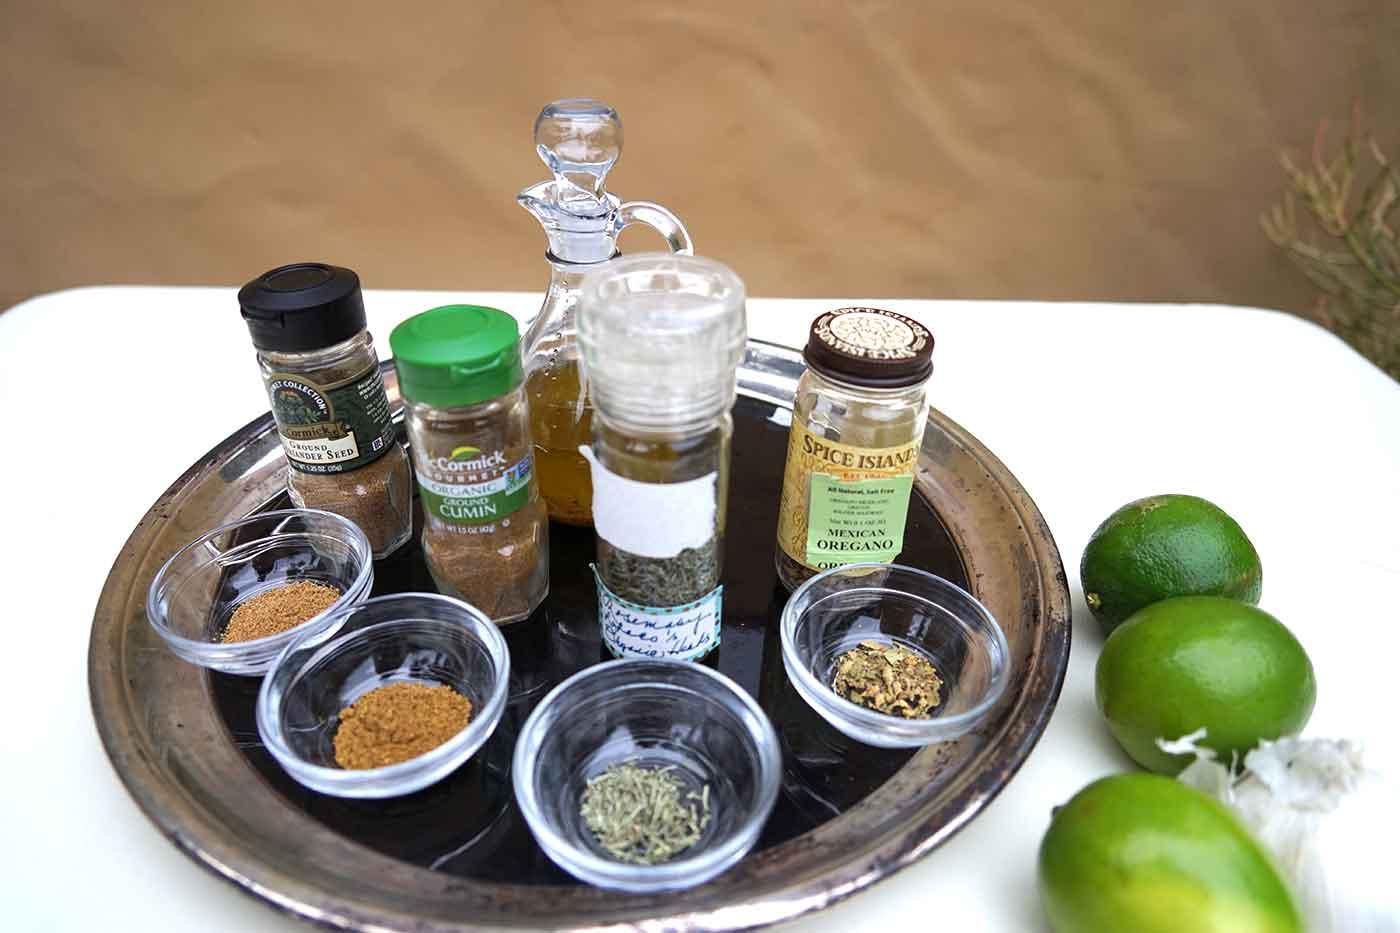 vegan garlic lime salad dressing ingredients on a table